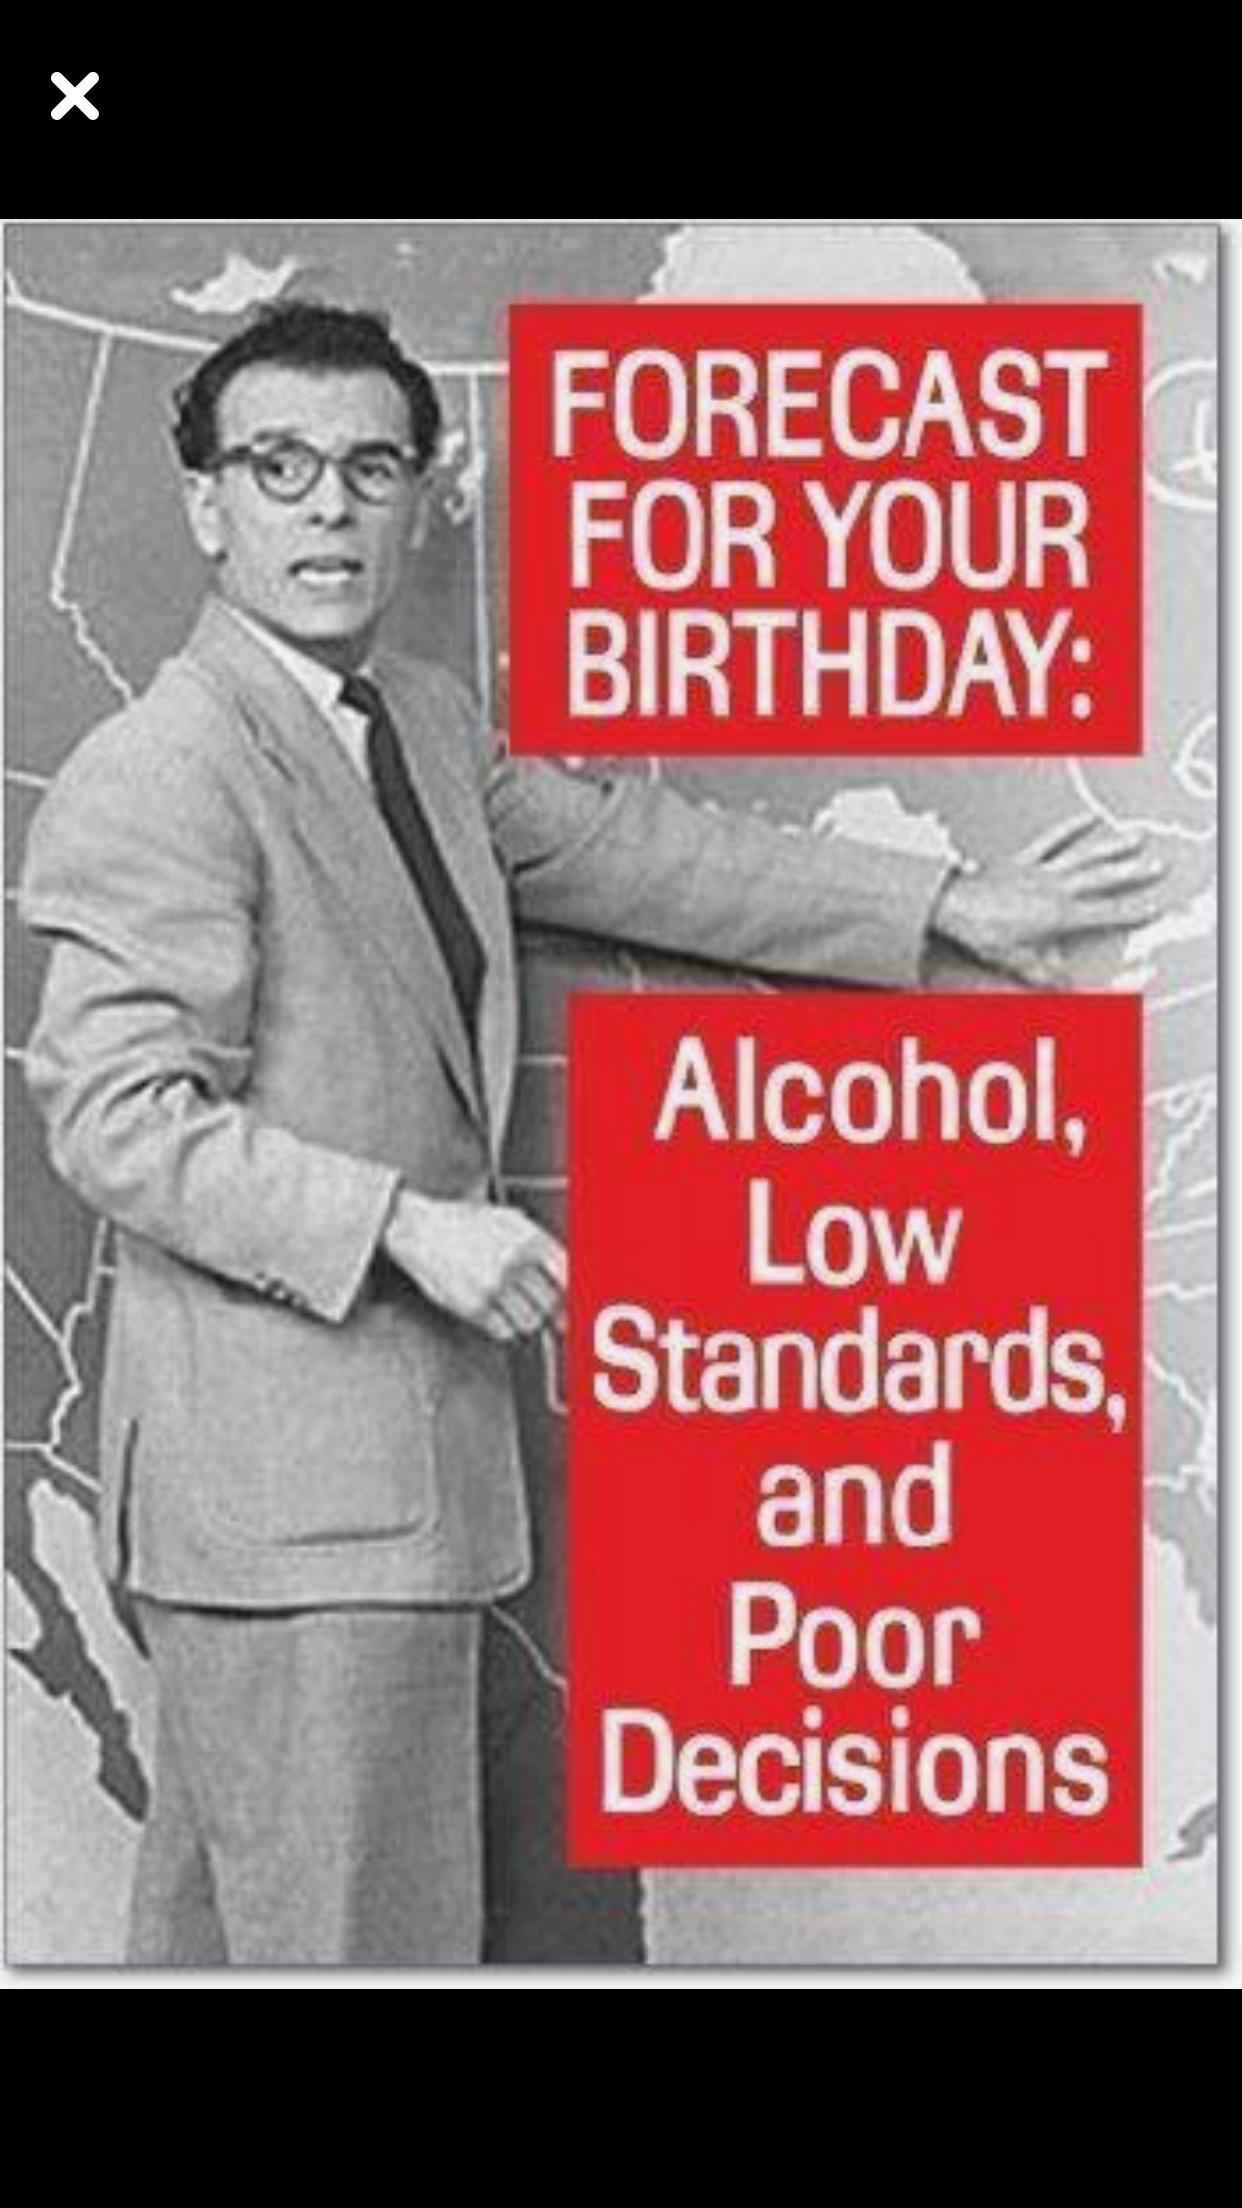 Pin By Anne T On Birthdays Birthday Humor Happy Birthday Funny Happy Birthday Cards